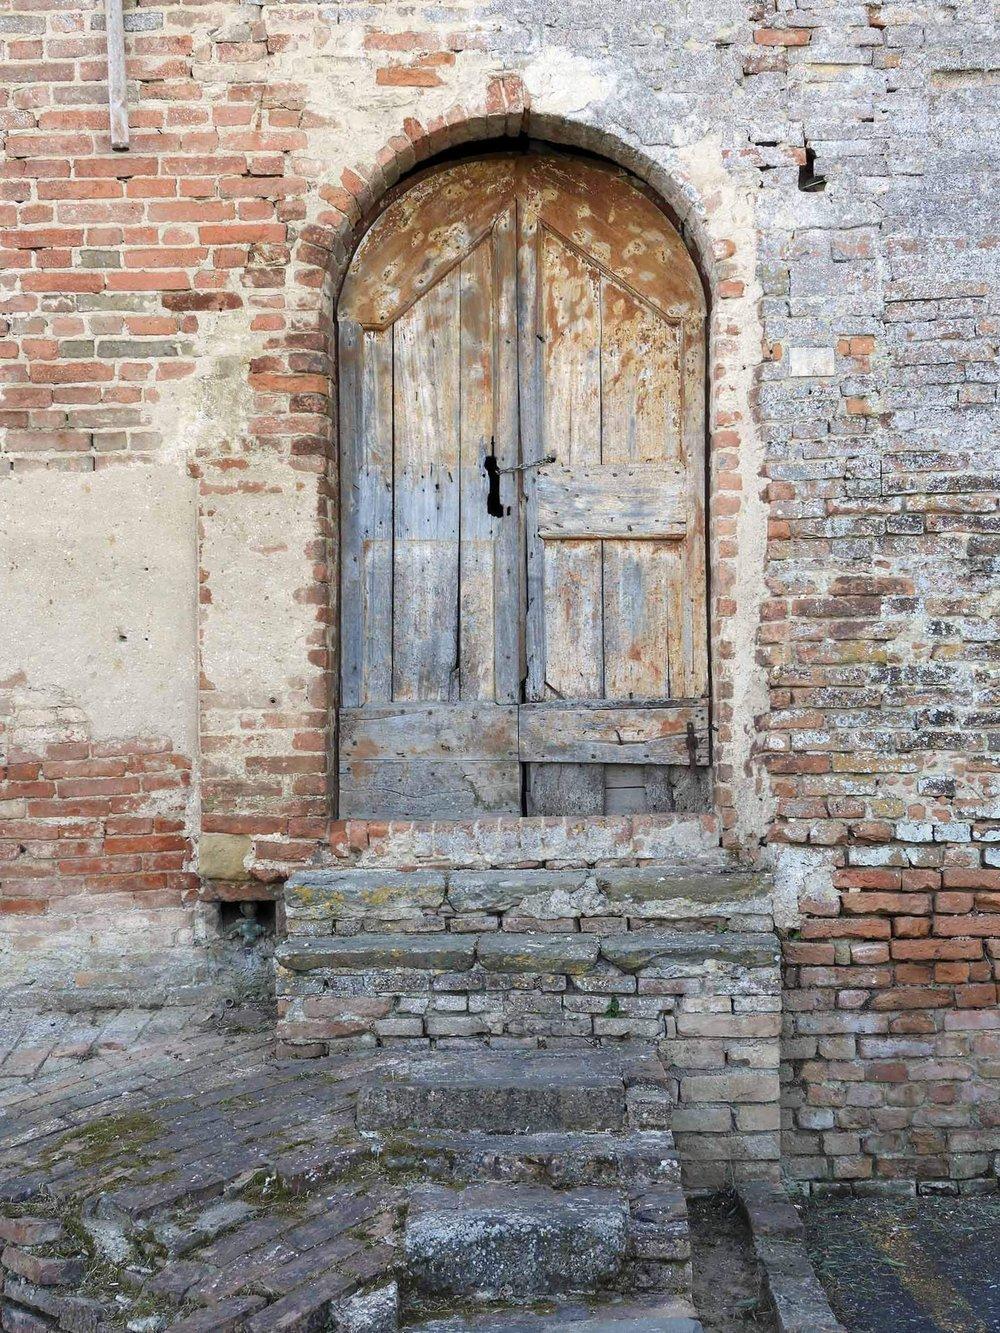 italy-italia-certaldo-old-tuscany-brick-wood-door-vintage-antique.JPG